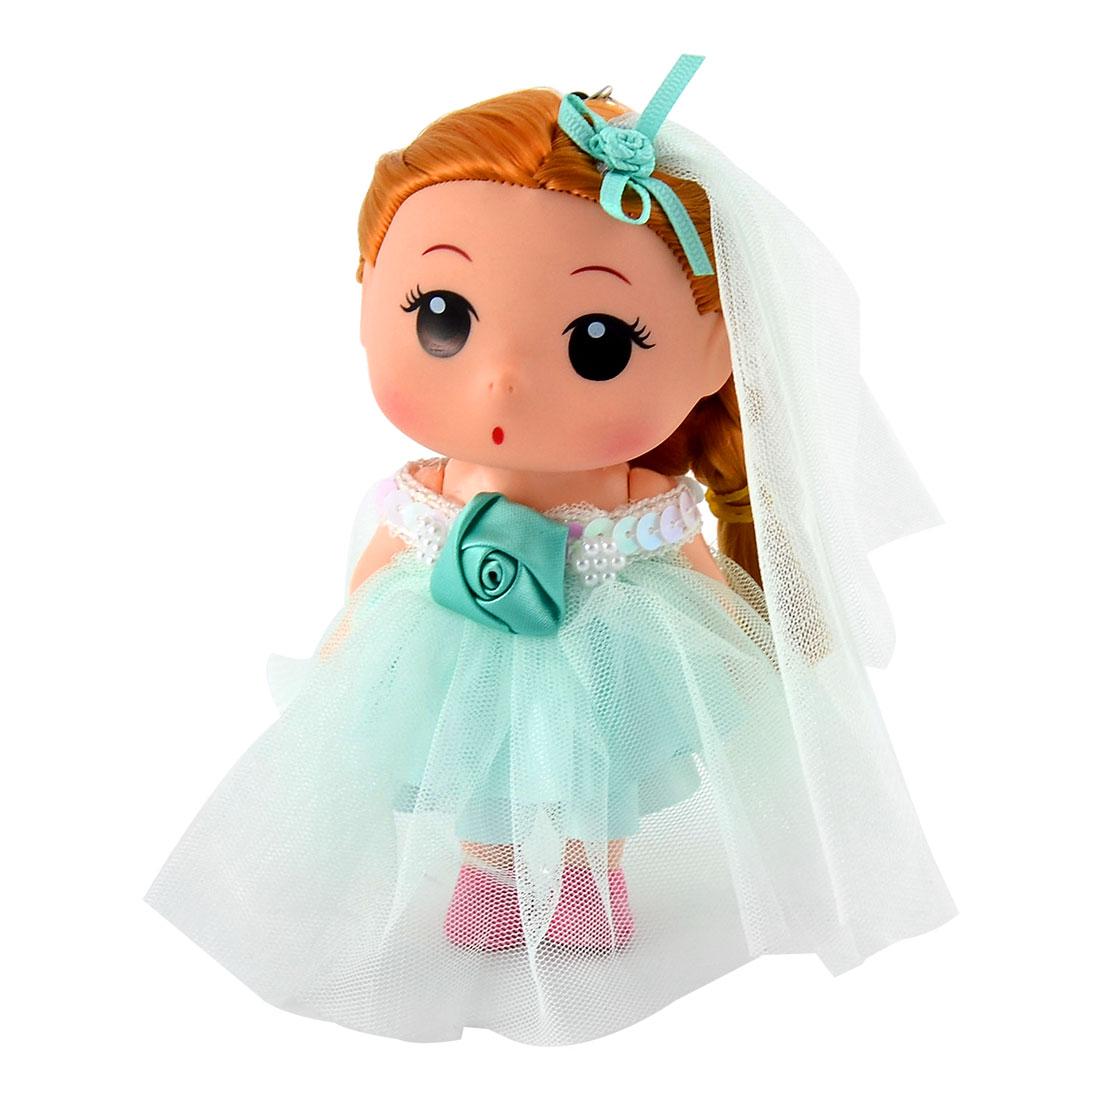 Women Handbag Innocent Girl Adornment Pendant Charm Doll Keychain Key Ring Green